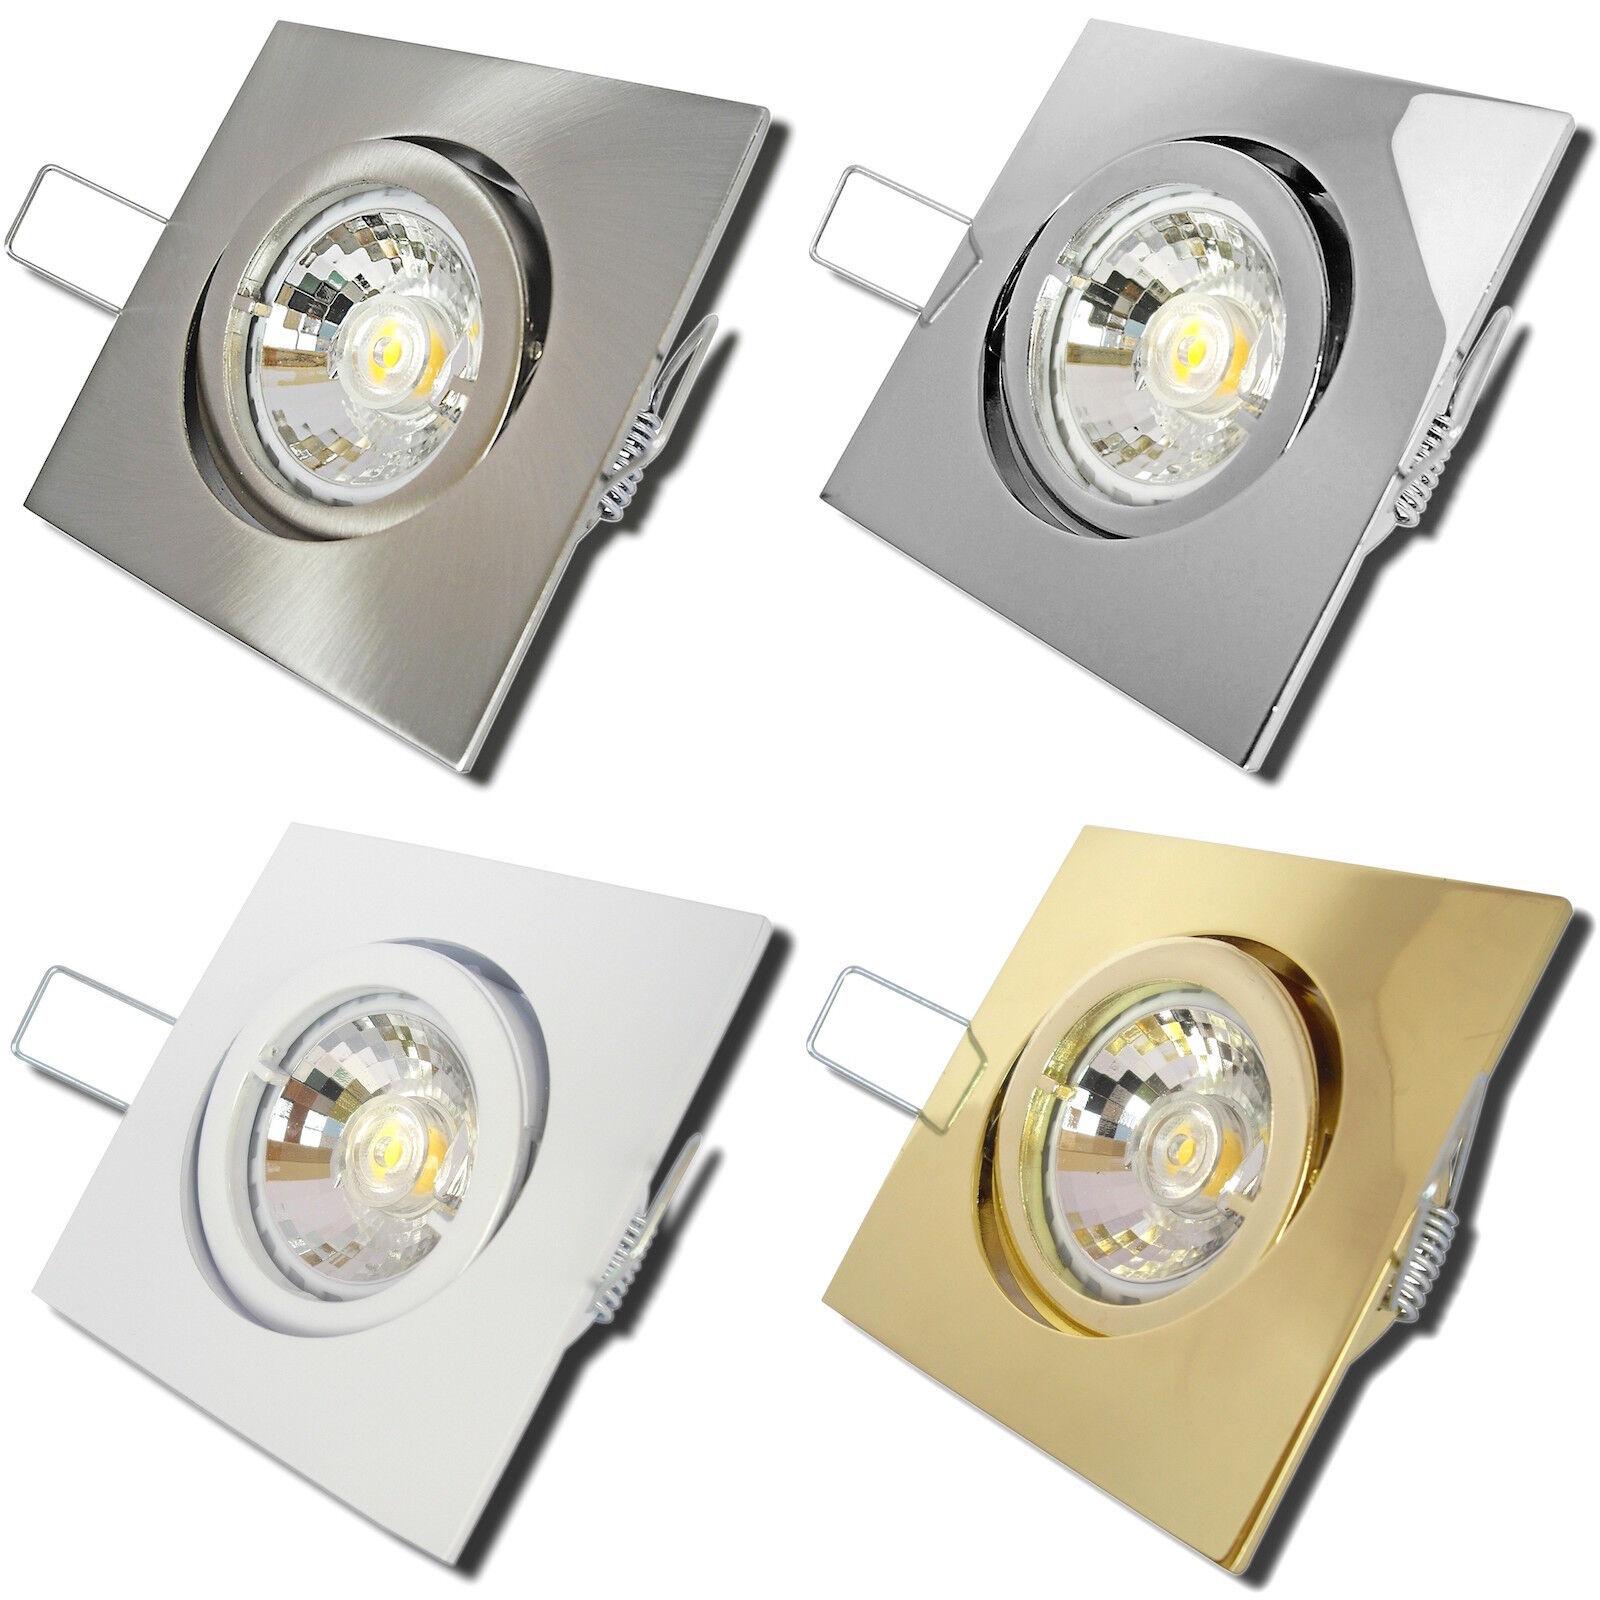 1 x LED Einbaustrahler Lana   230V   5W   400Lumen   IP20   Rostfreie Leuchten